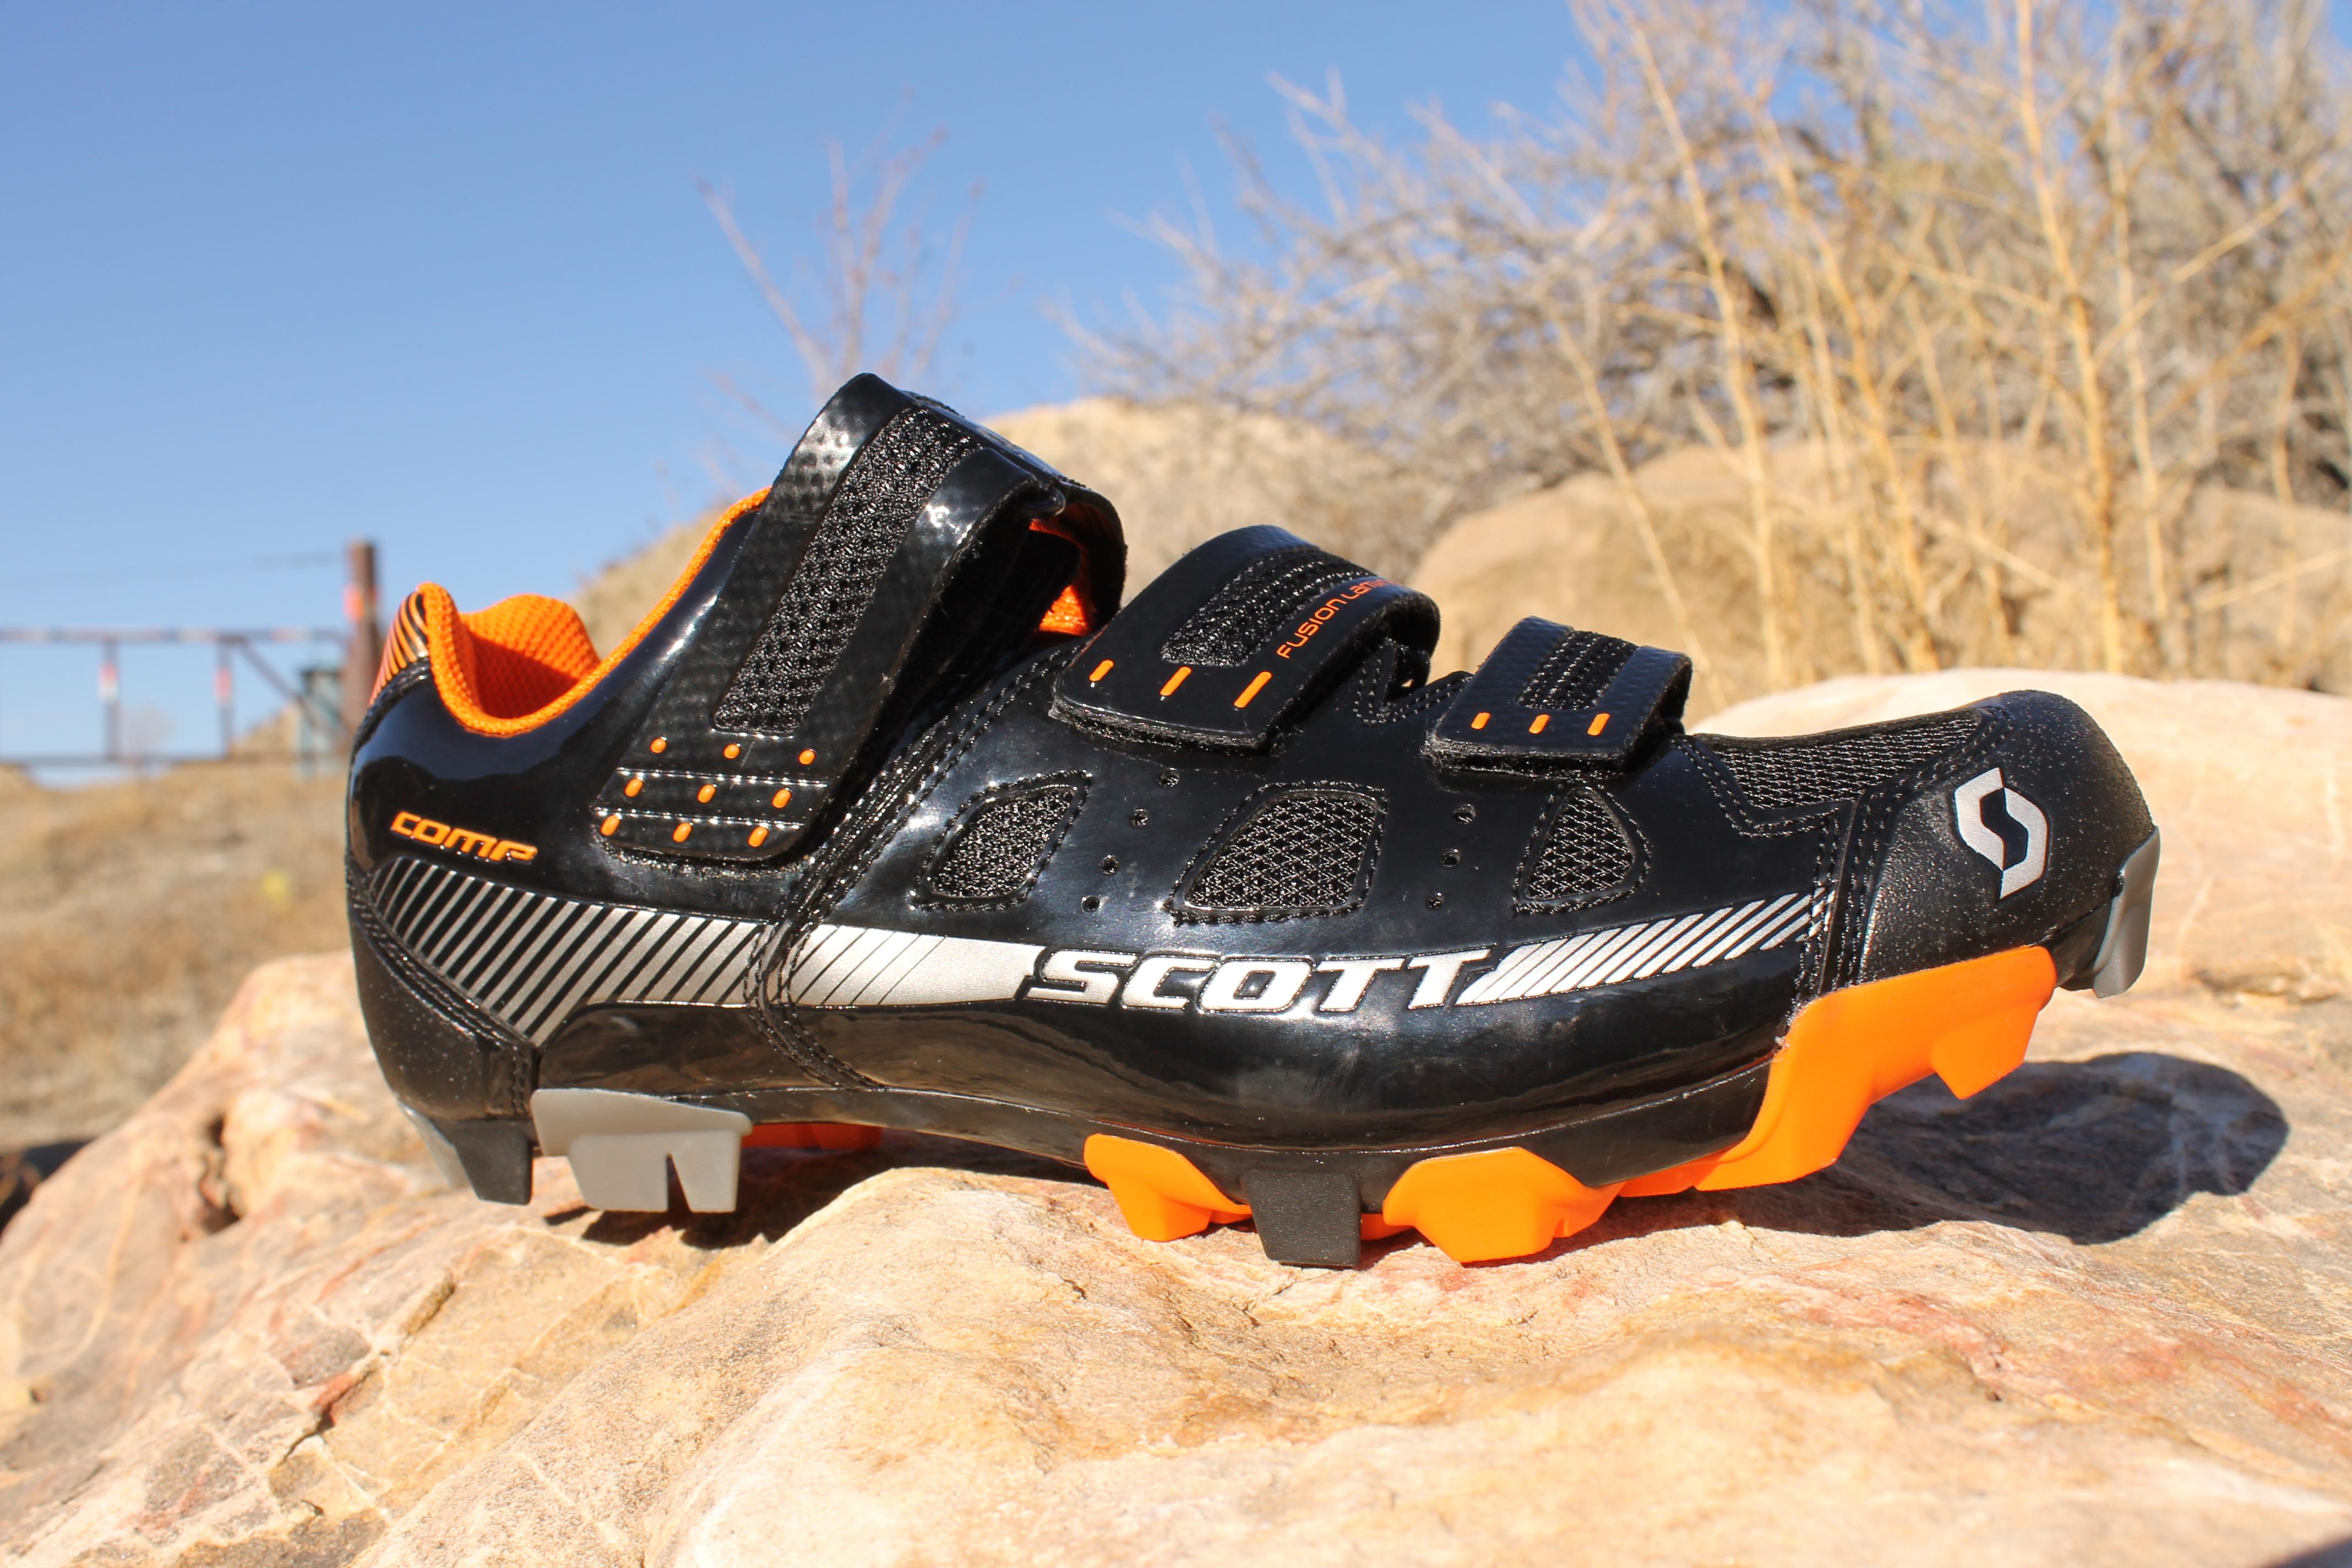 Scott Mtb Comp Shoe Review Singletracks Mountain Bike News